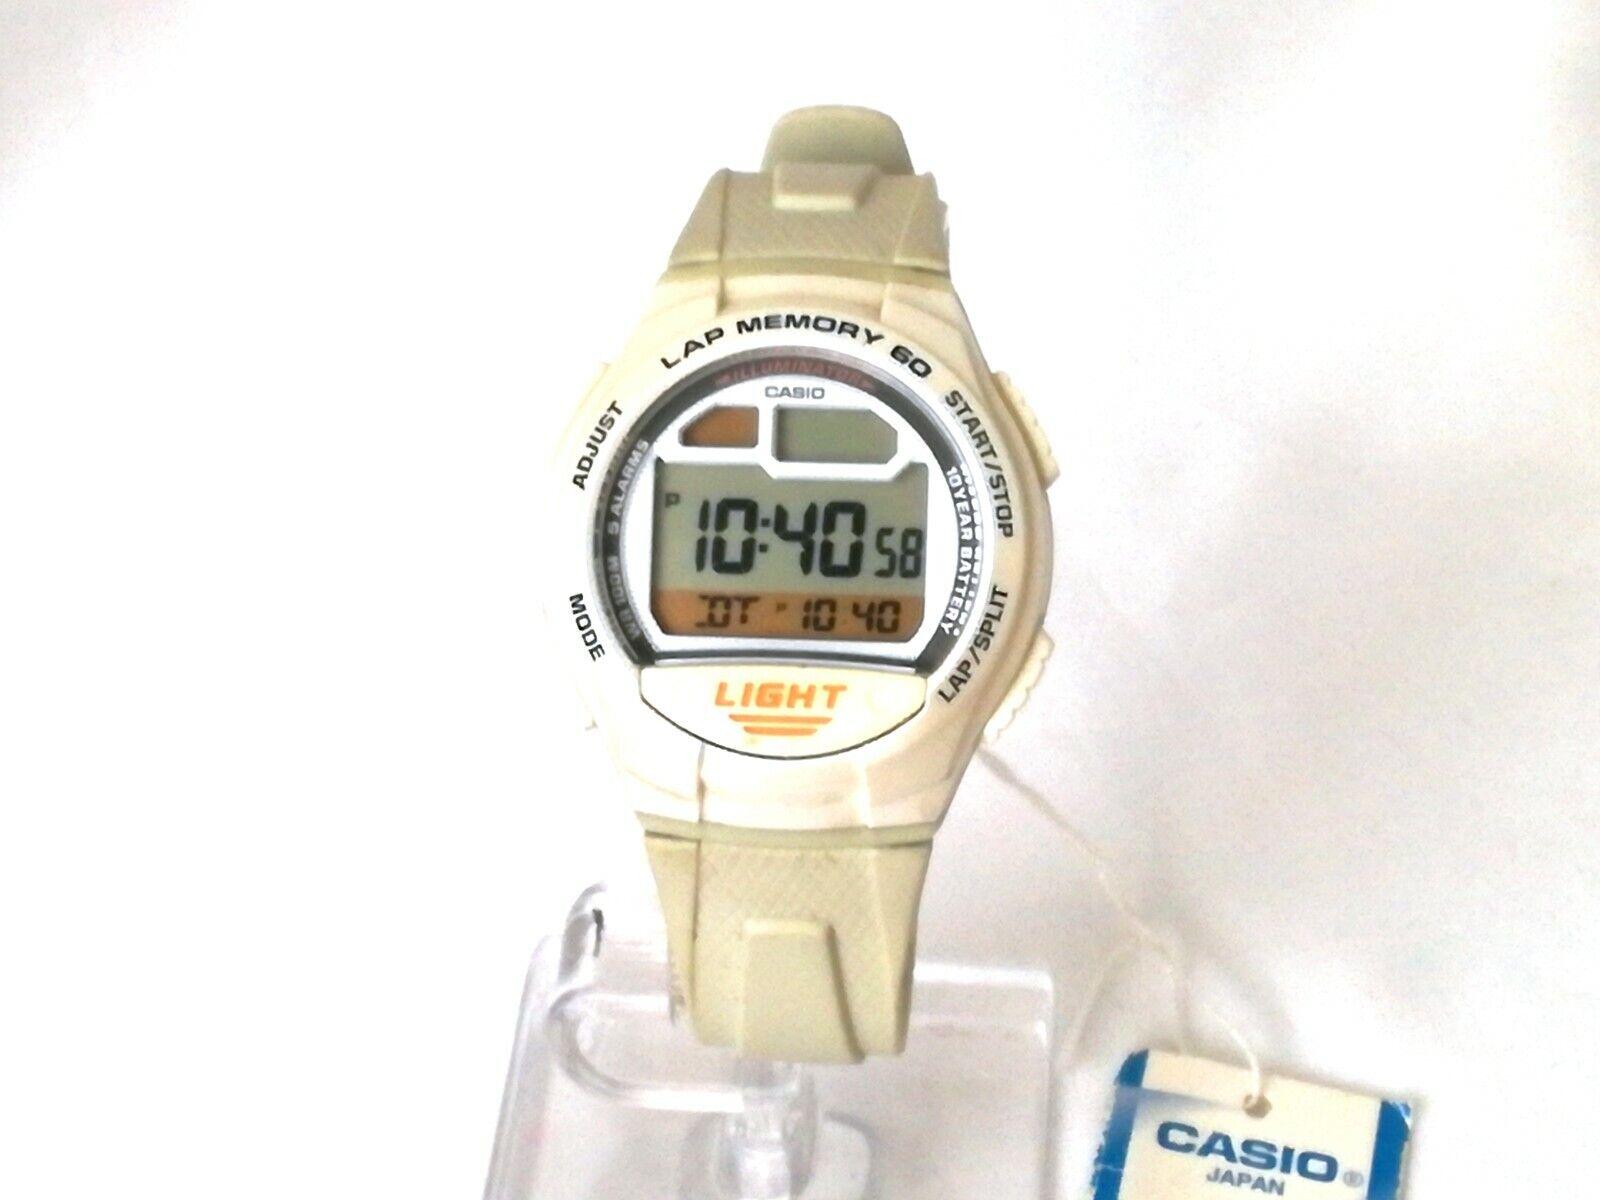 Reloj pulsera hombre CASIO LAP MEMORY 60 QUARTZ 3283 W-734 Original vintage